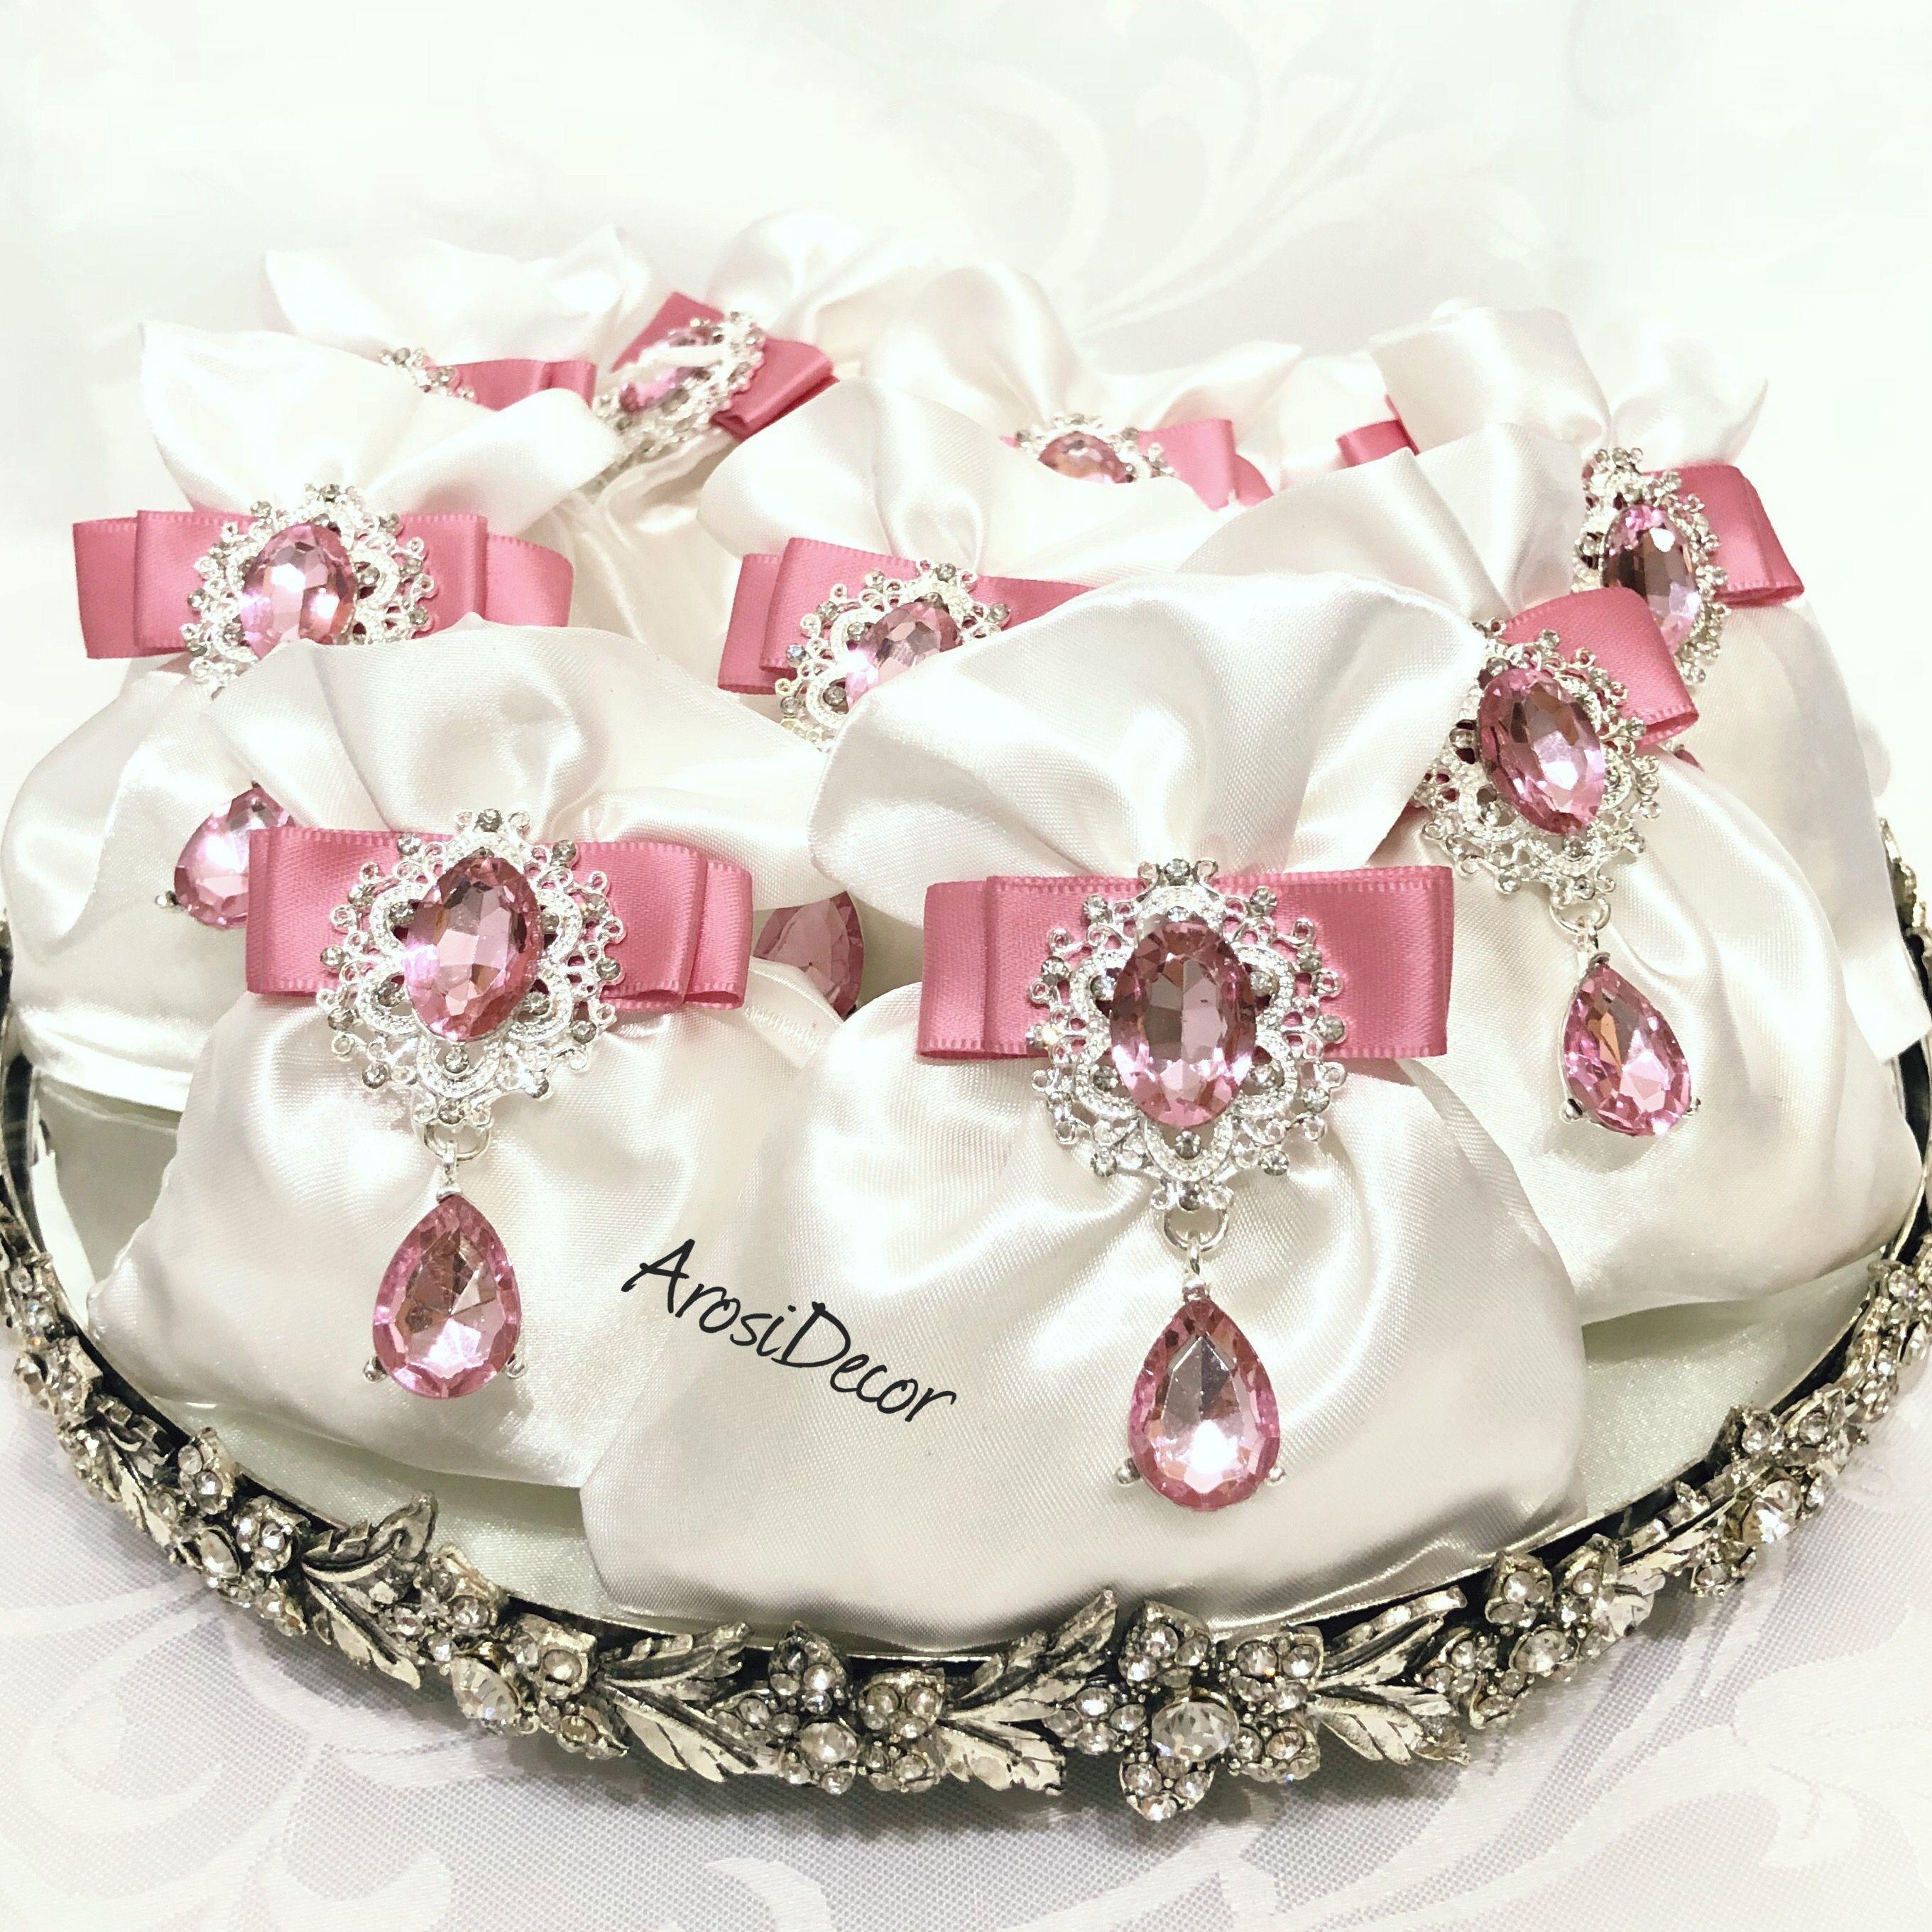 Luxury Wedding favour bags. #wedding #arosi #bride #weddingfavours ...